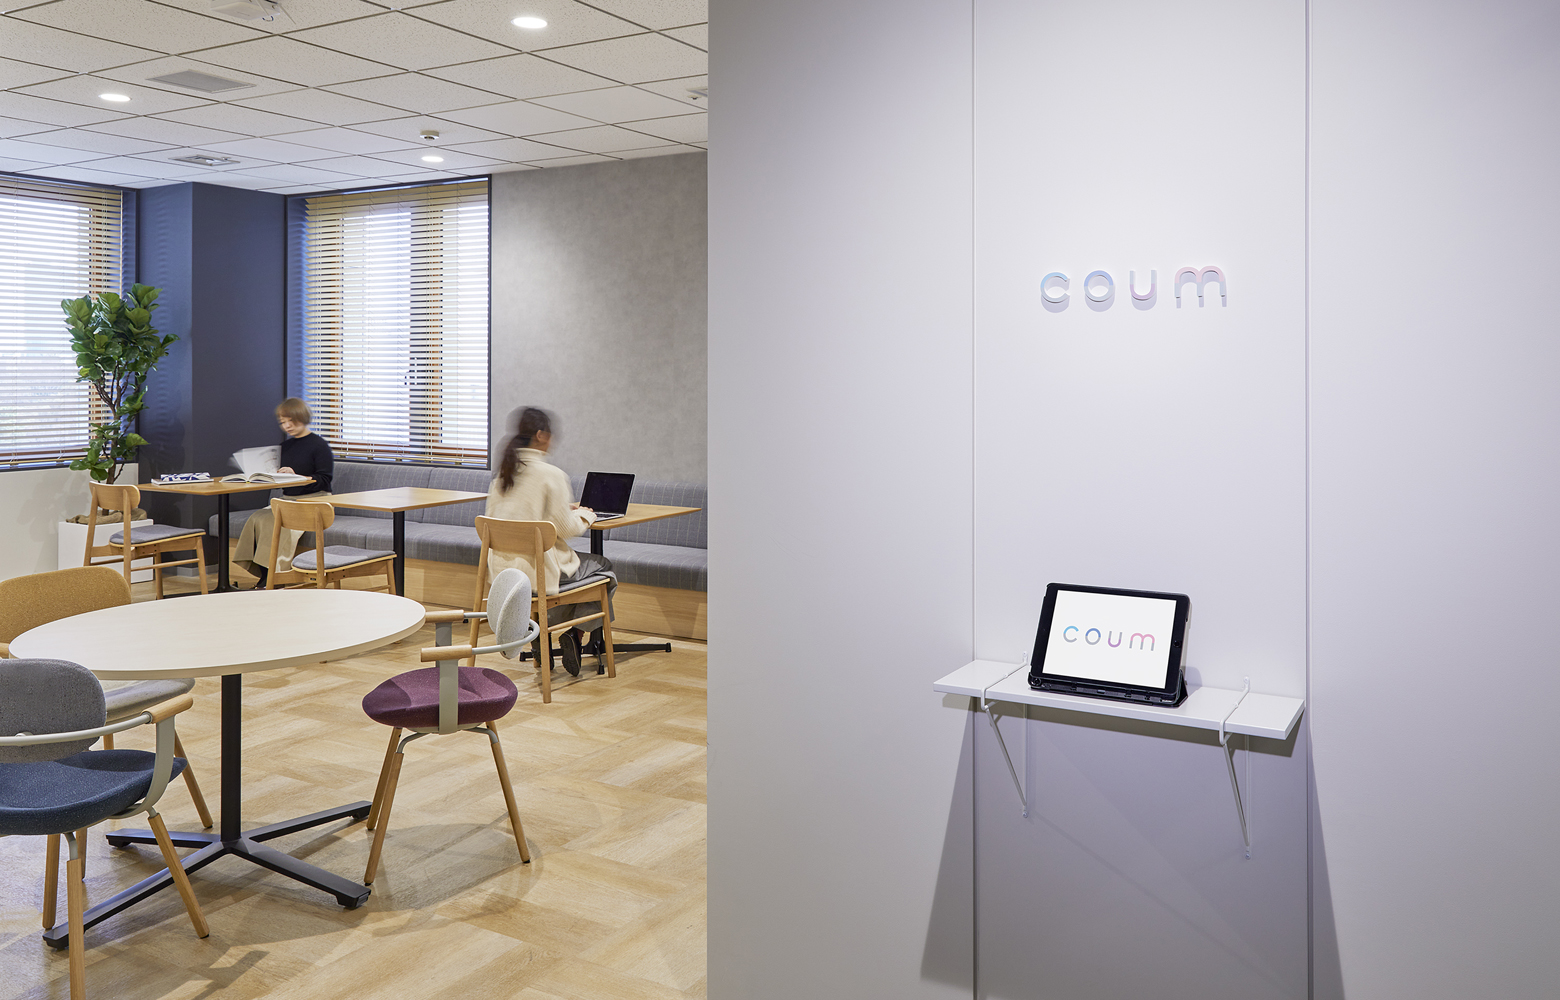 Coum株式会社 Entrance デザイン・レイアウト事例